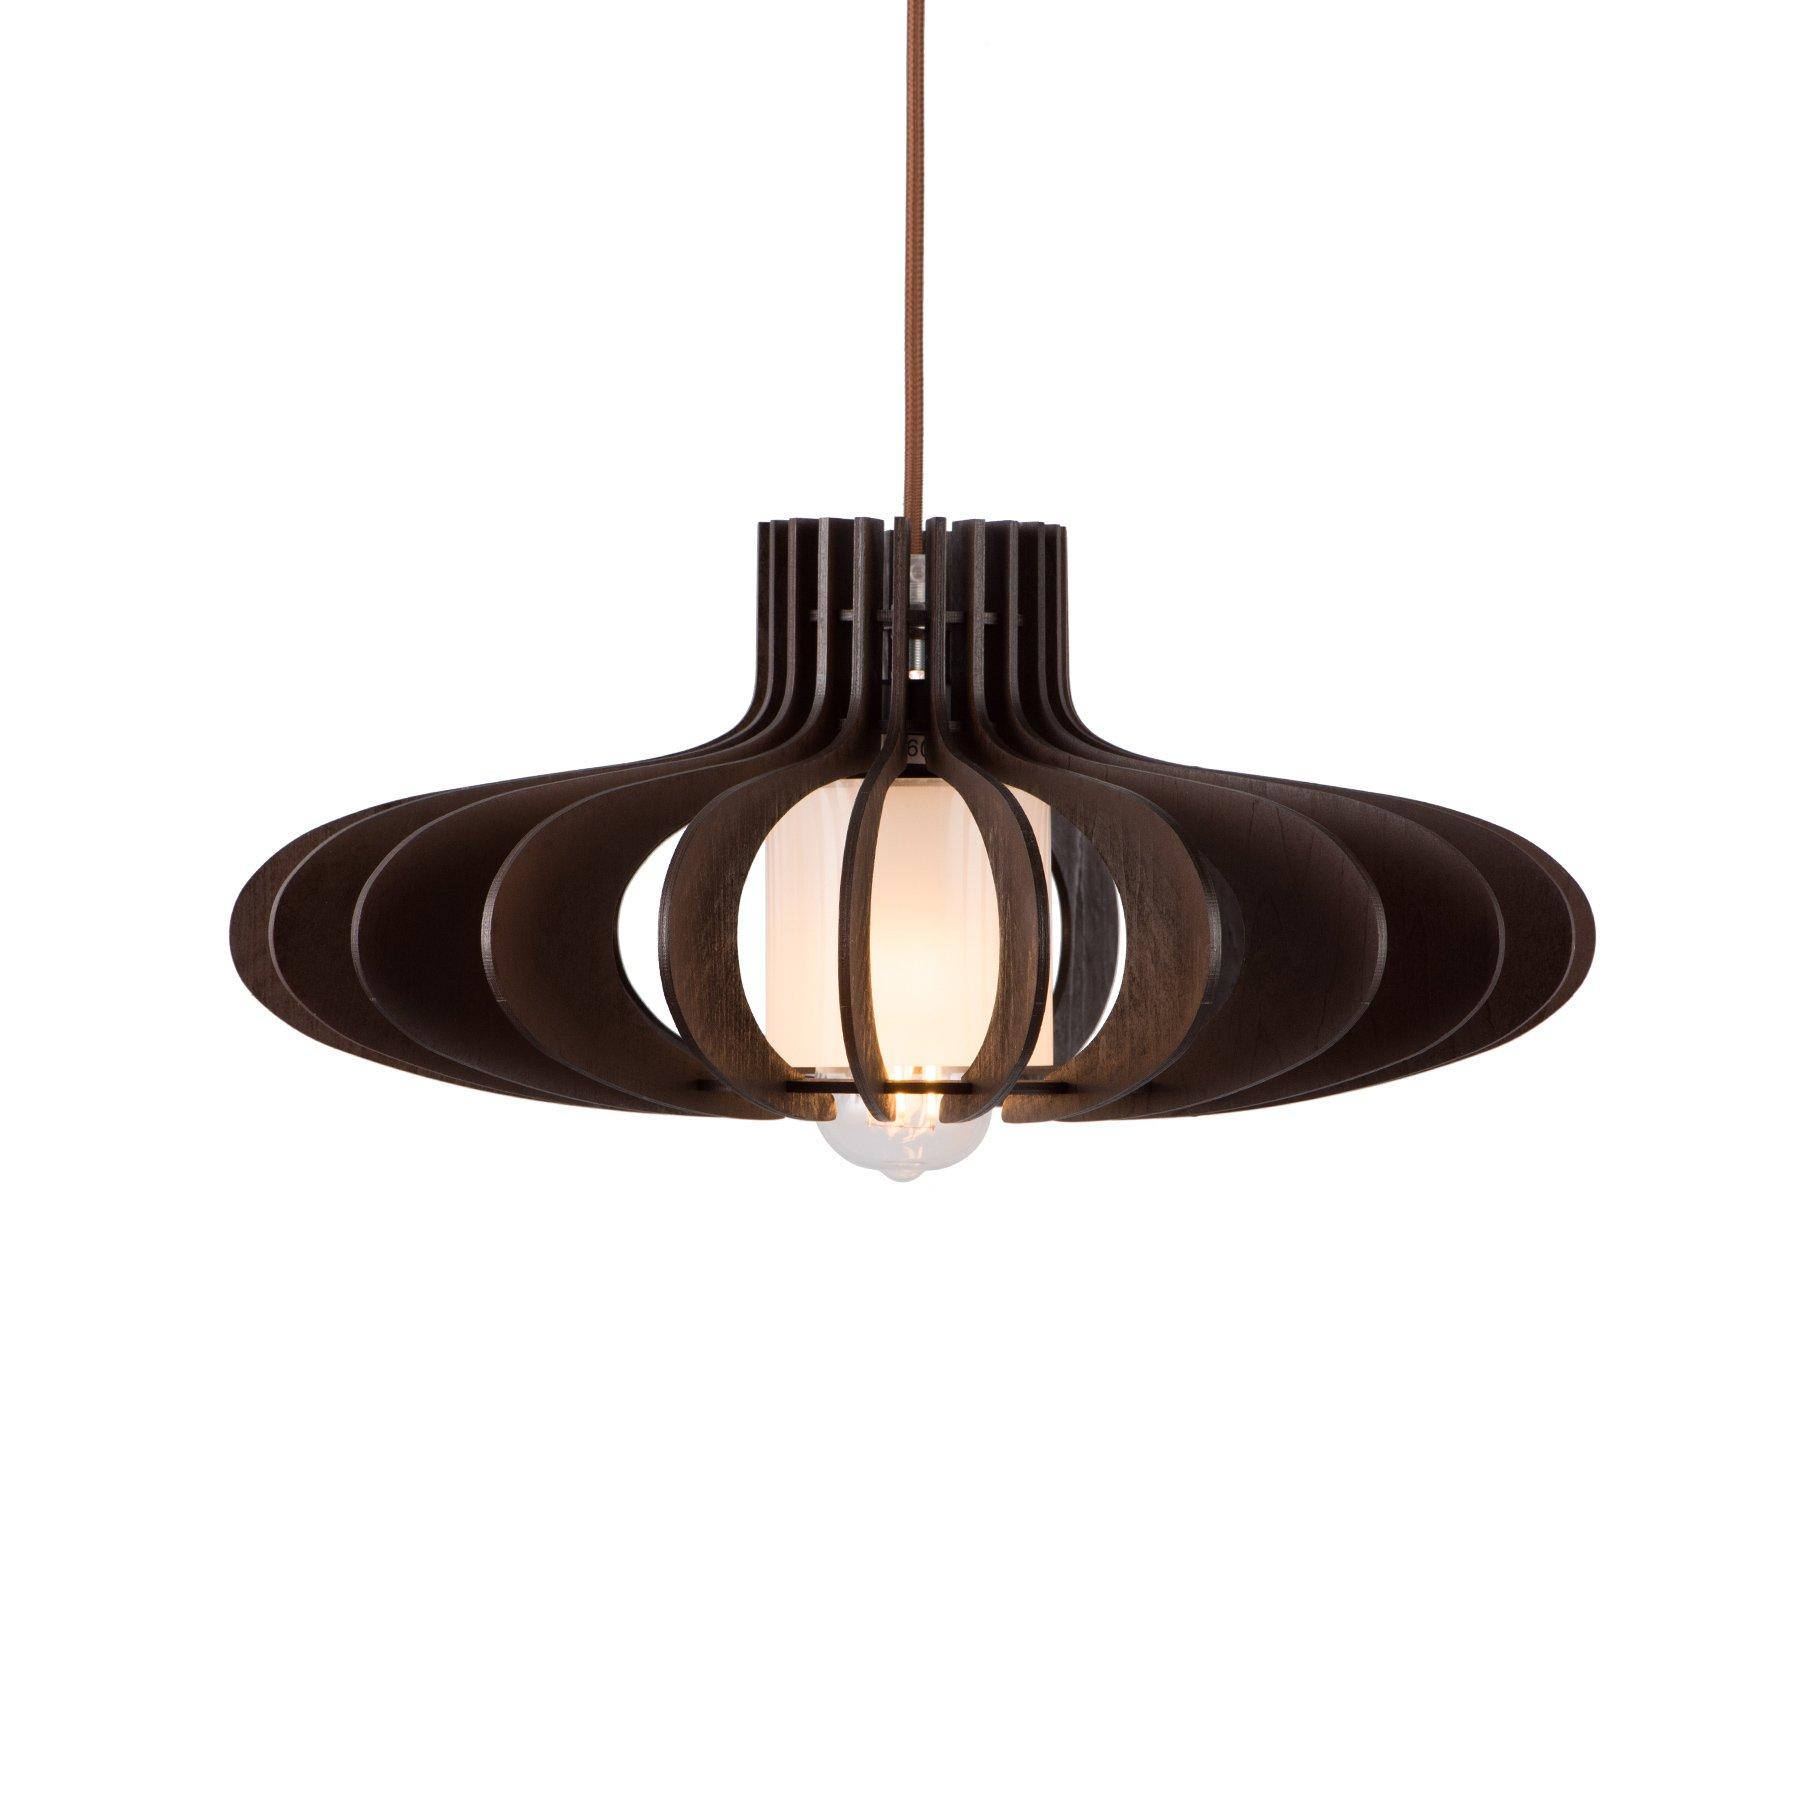 MAYKKE Oban Medium Wooden Pendant Lamp   Lantern Style with Dark Brown Rings, Hanging Light with Adjustable Cord   Walnut Wood Finish, MDB1040201 by Maykke (Image #4)